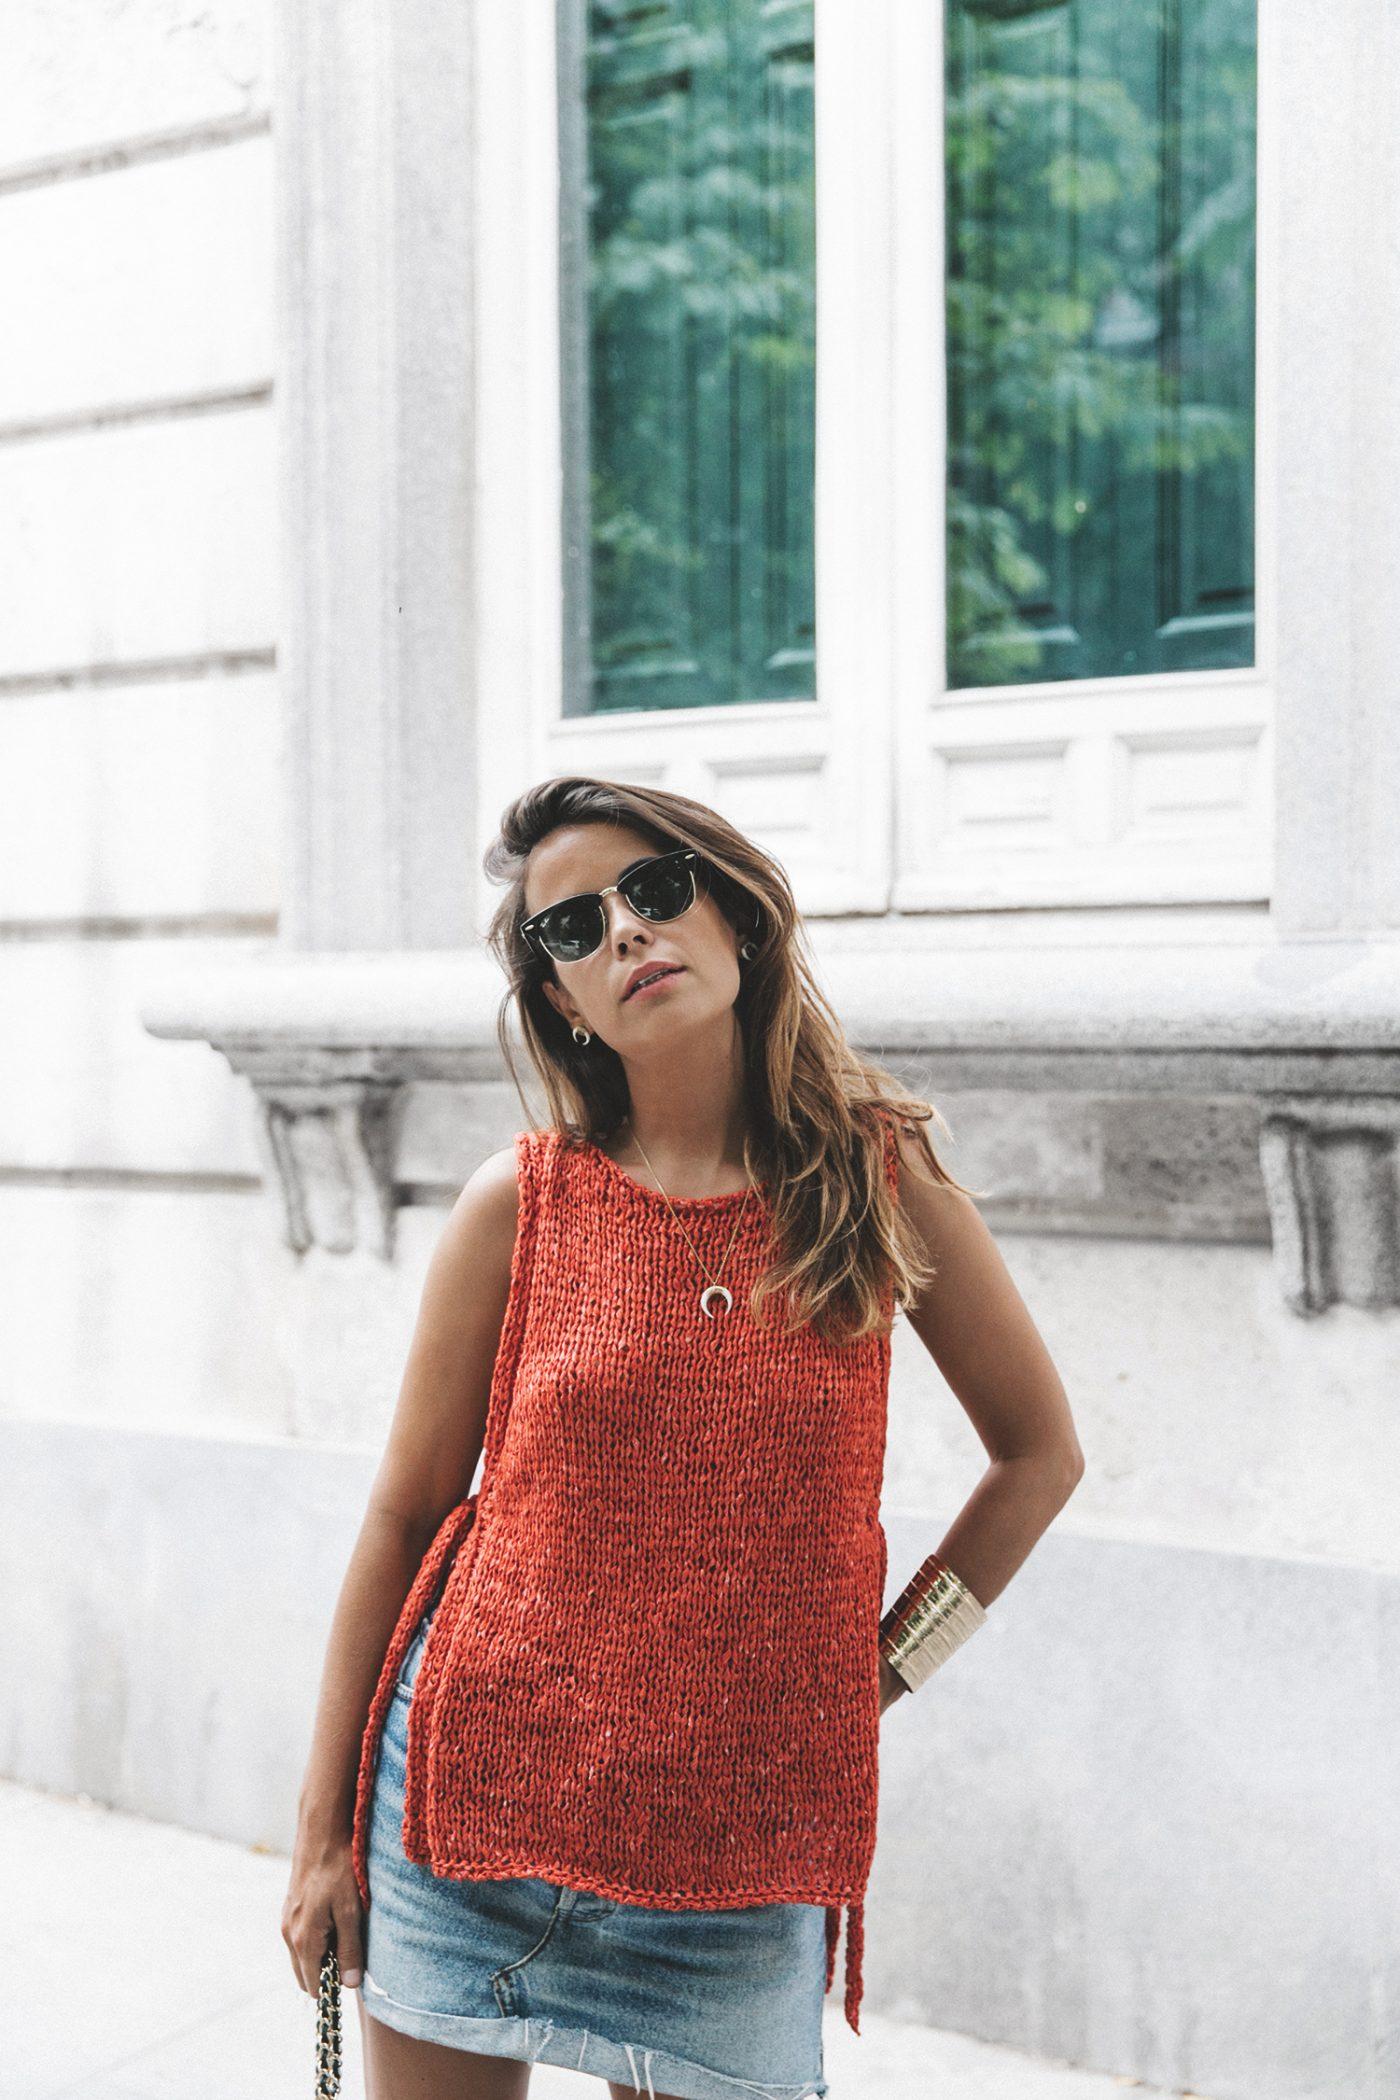 Summery_knit-Levis_Vintage_Skirt-Zalando_Espadrilles-Black_Sandals-Collage_Vintage_Horn_Necklace-Outfit-Street_Style-2